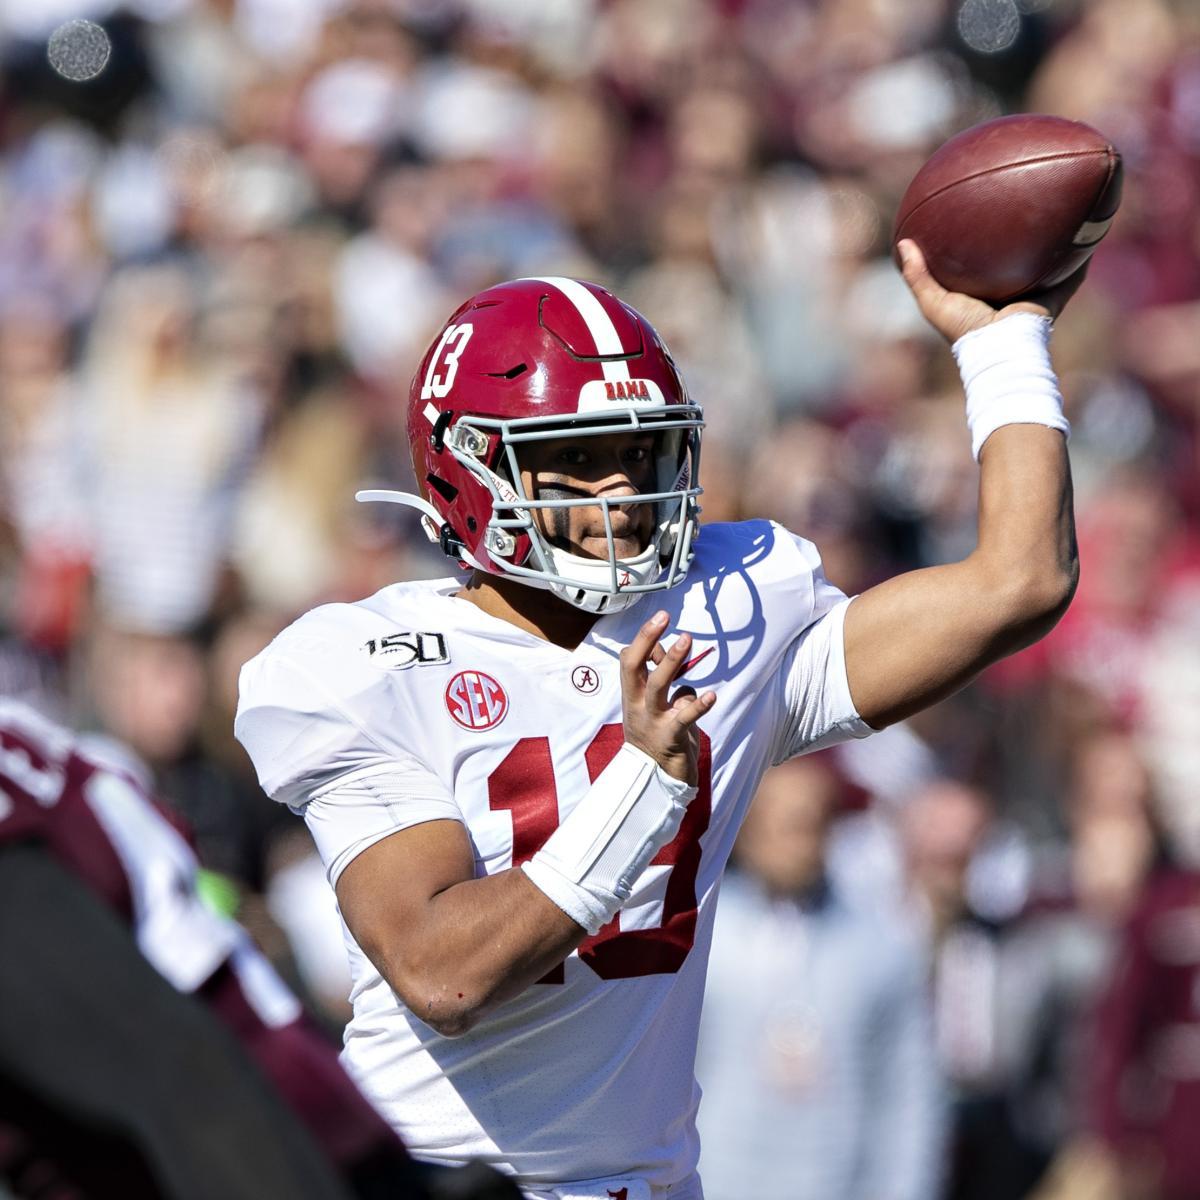 Alabama's Tua Tagovailoa to Consult Family on 2020 NFL Draft 'Business Decision'